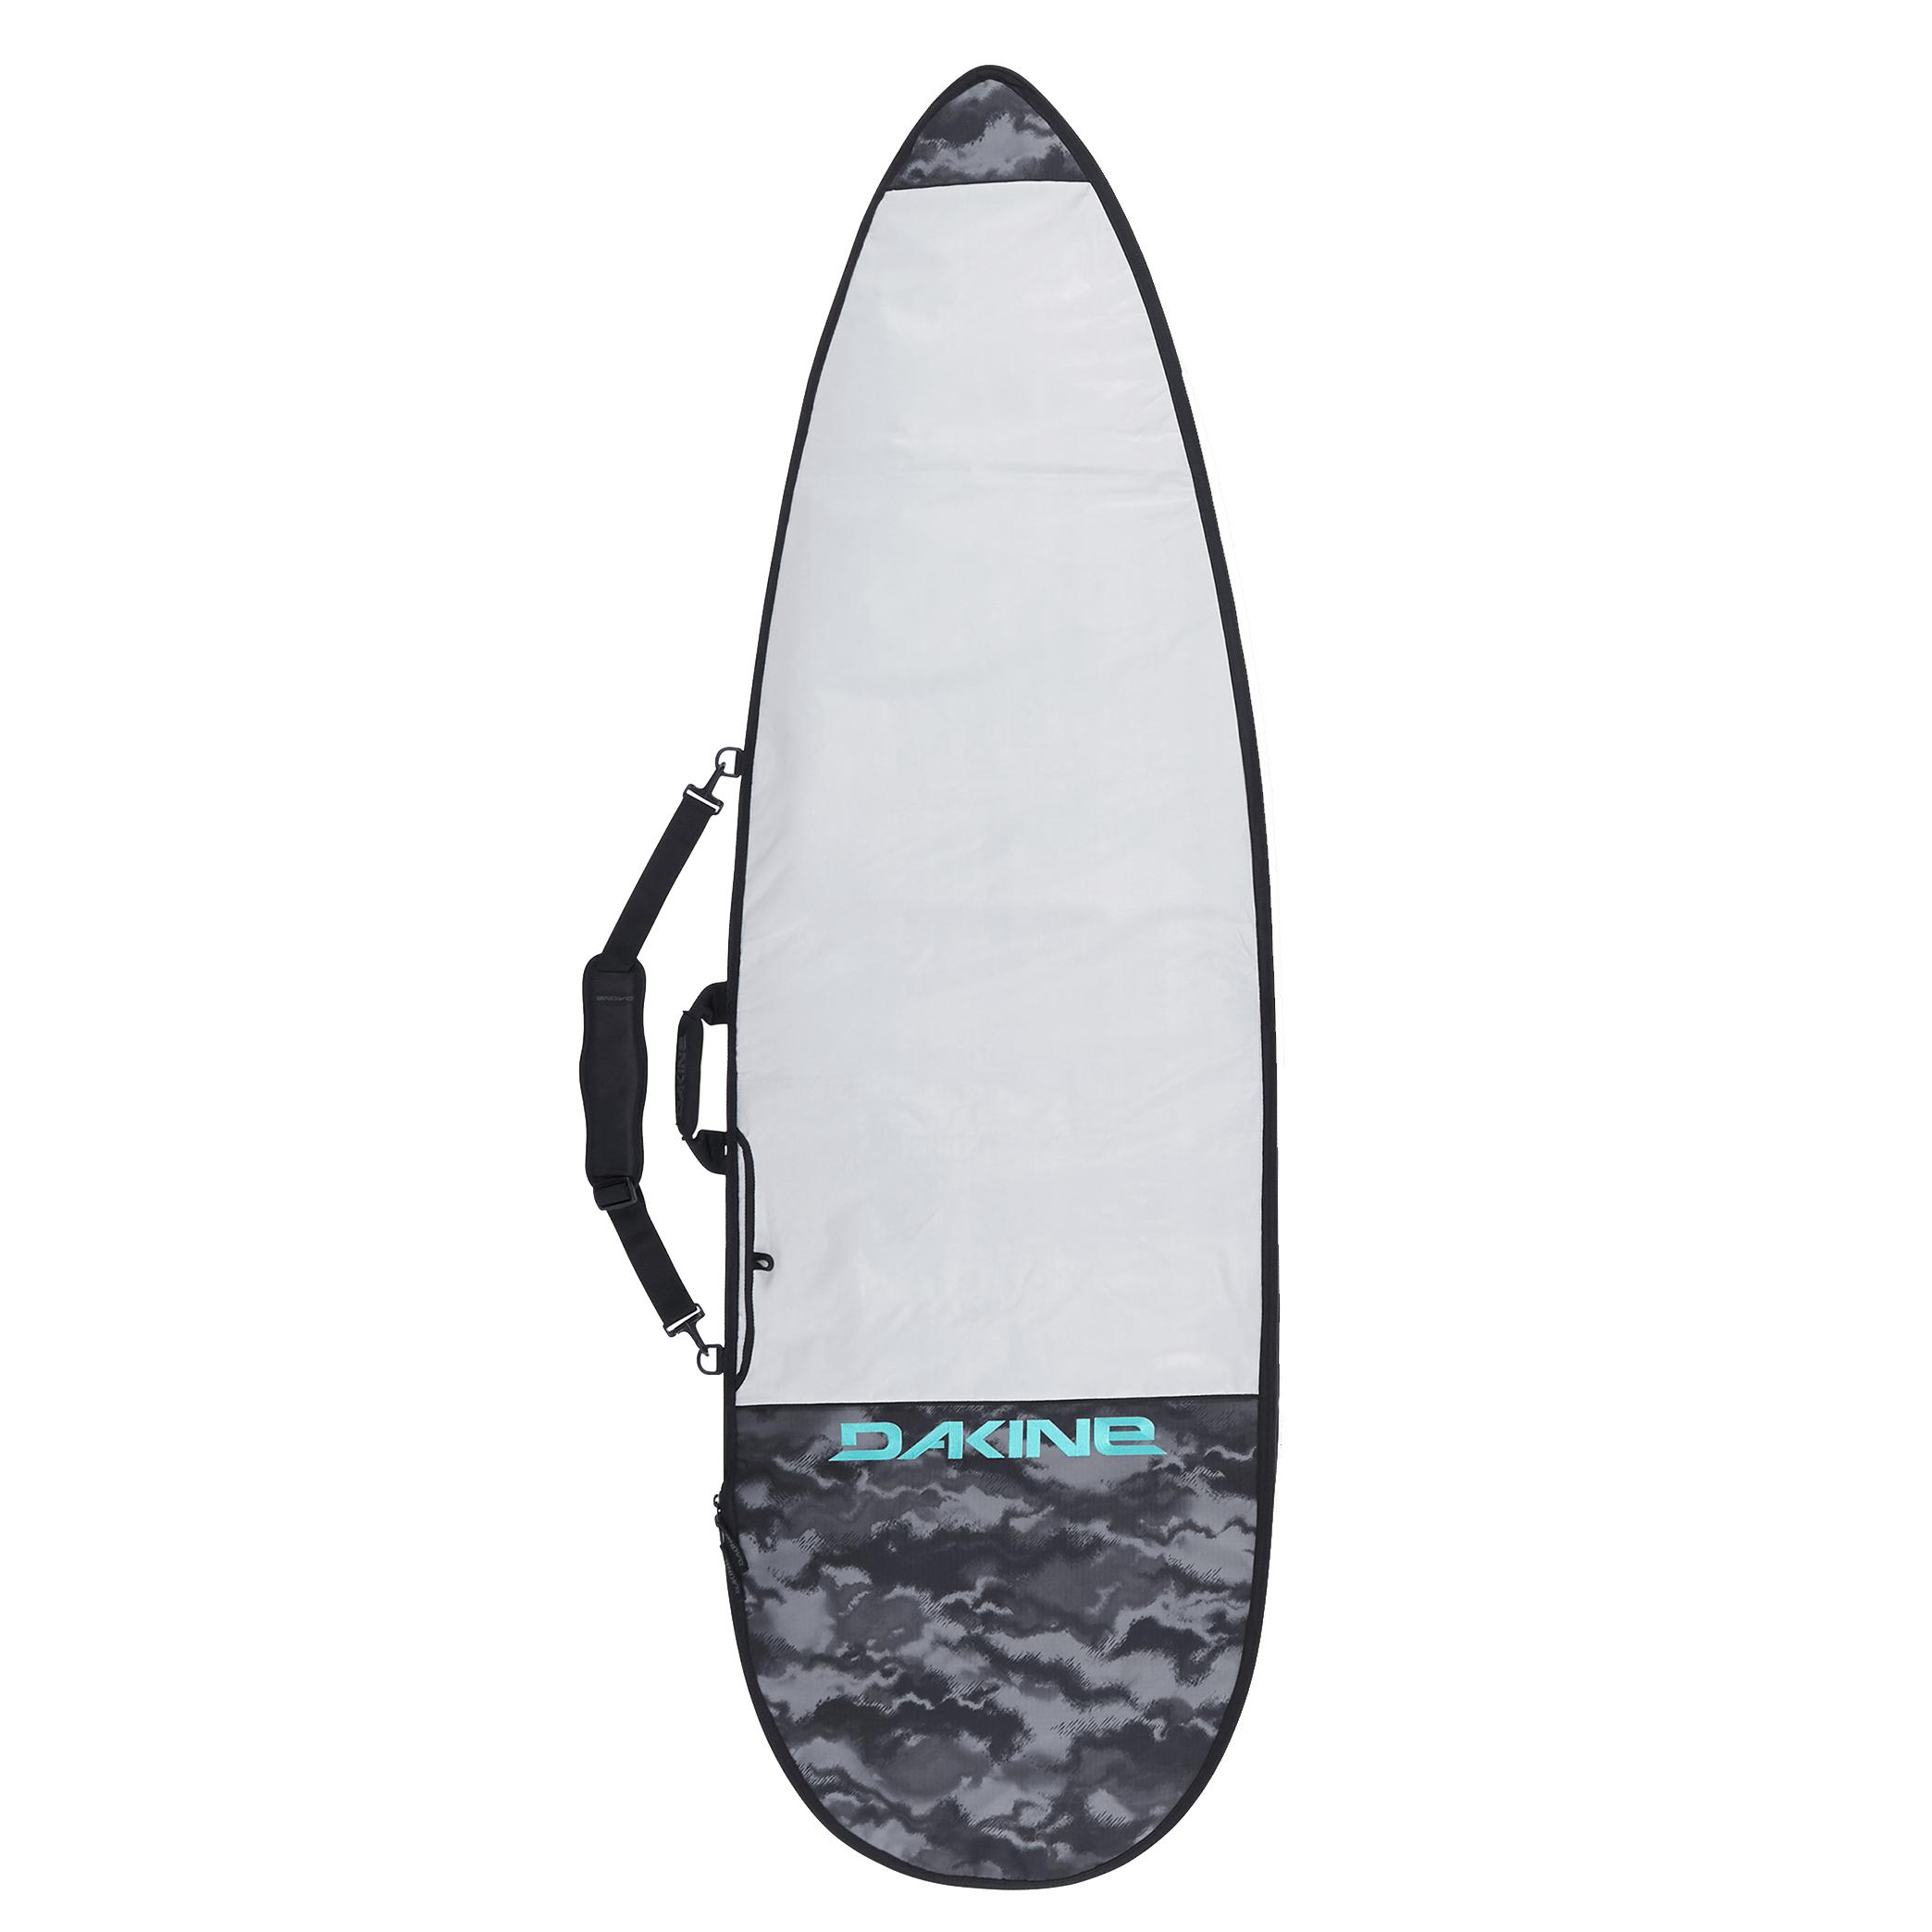 Dakine Shuttle Thruster Luggage Surfboard Bag White All Sizes